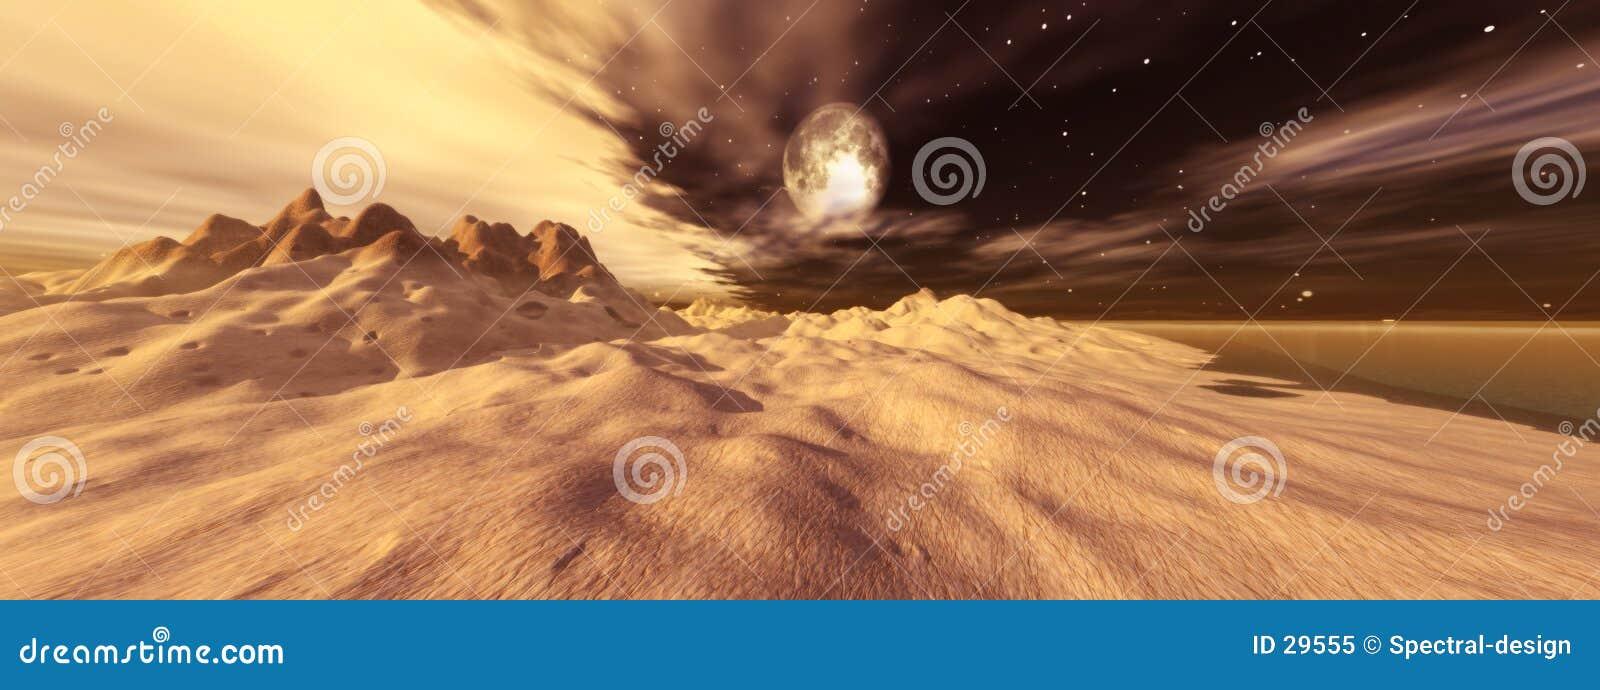 Księżyc tusken